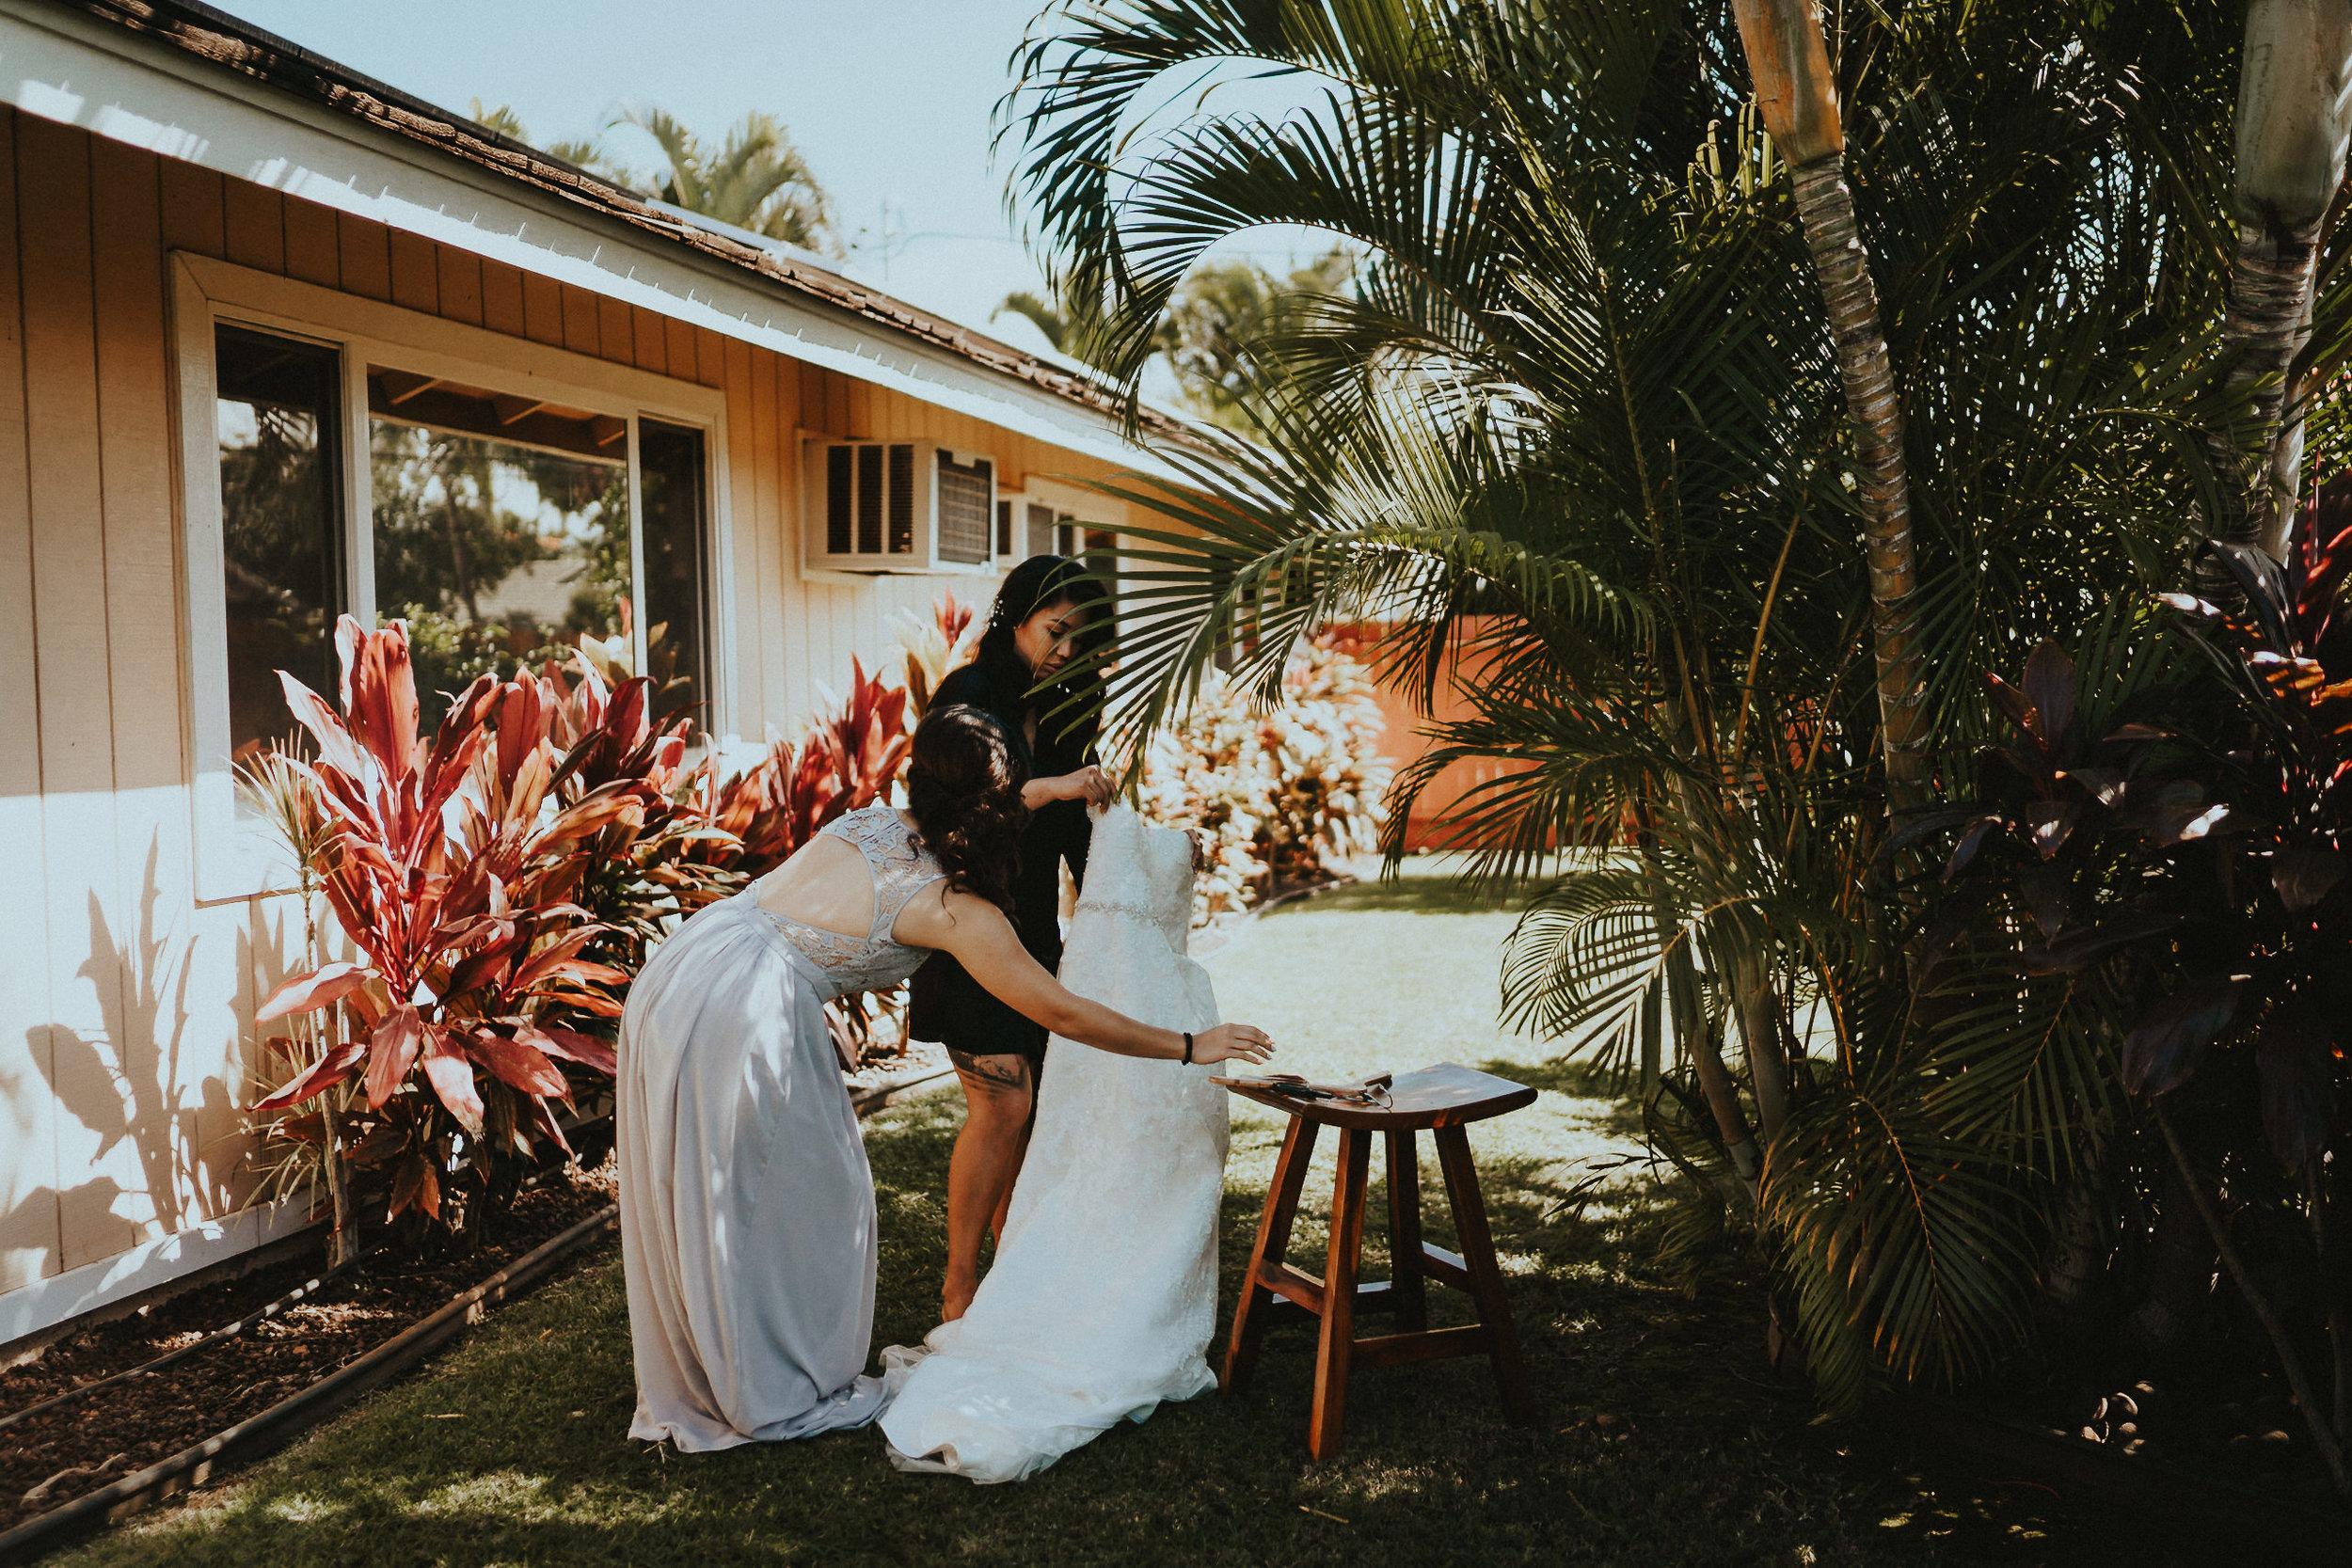 Maui_Destination_wedding_Alfred_Tang-07259.jpg